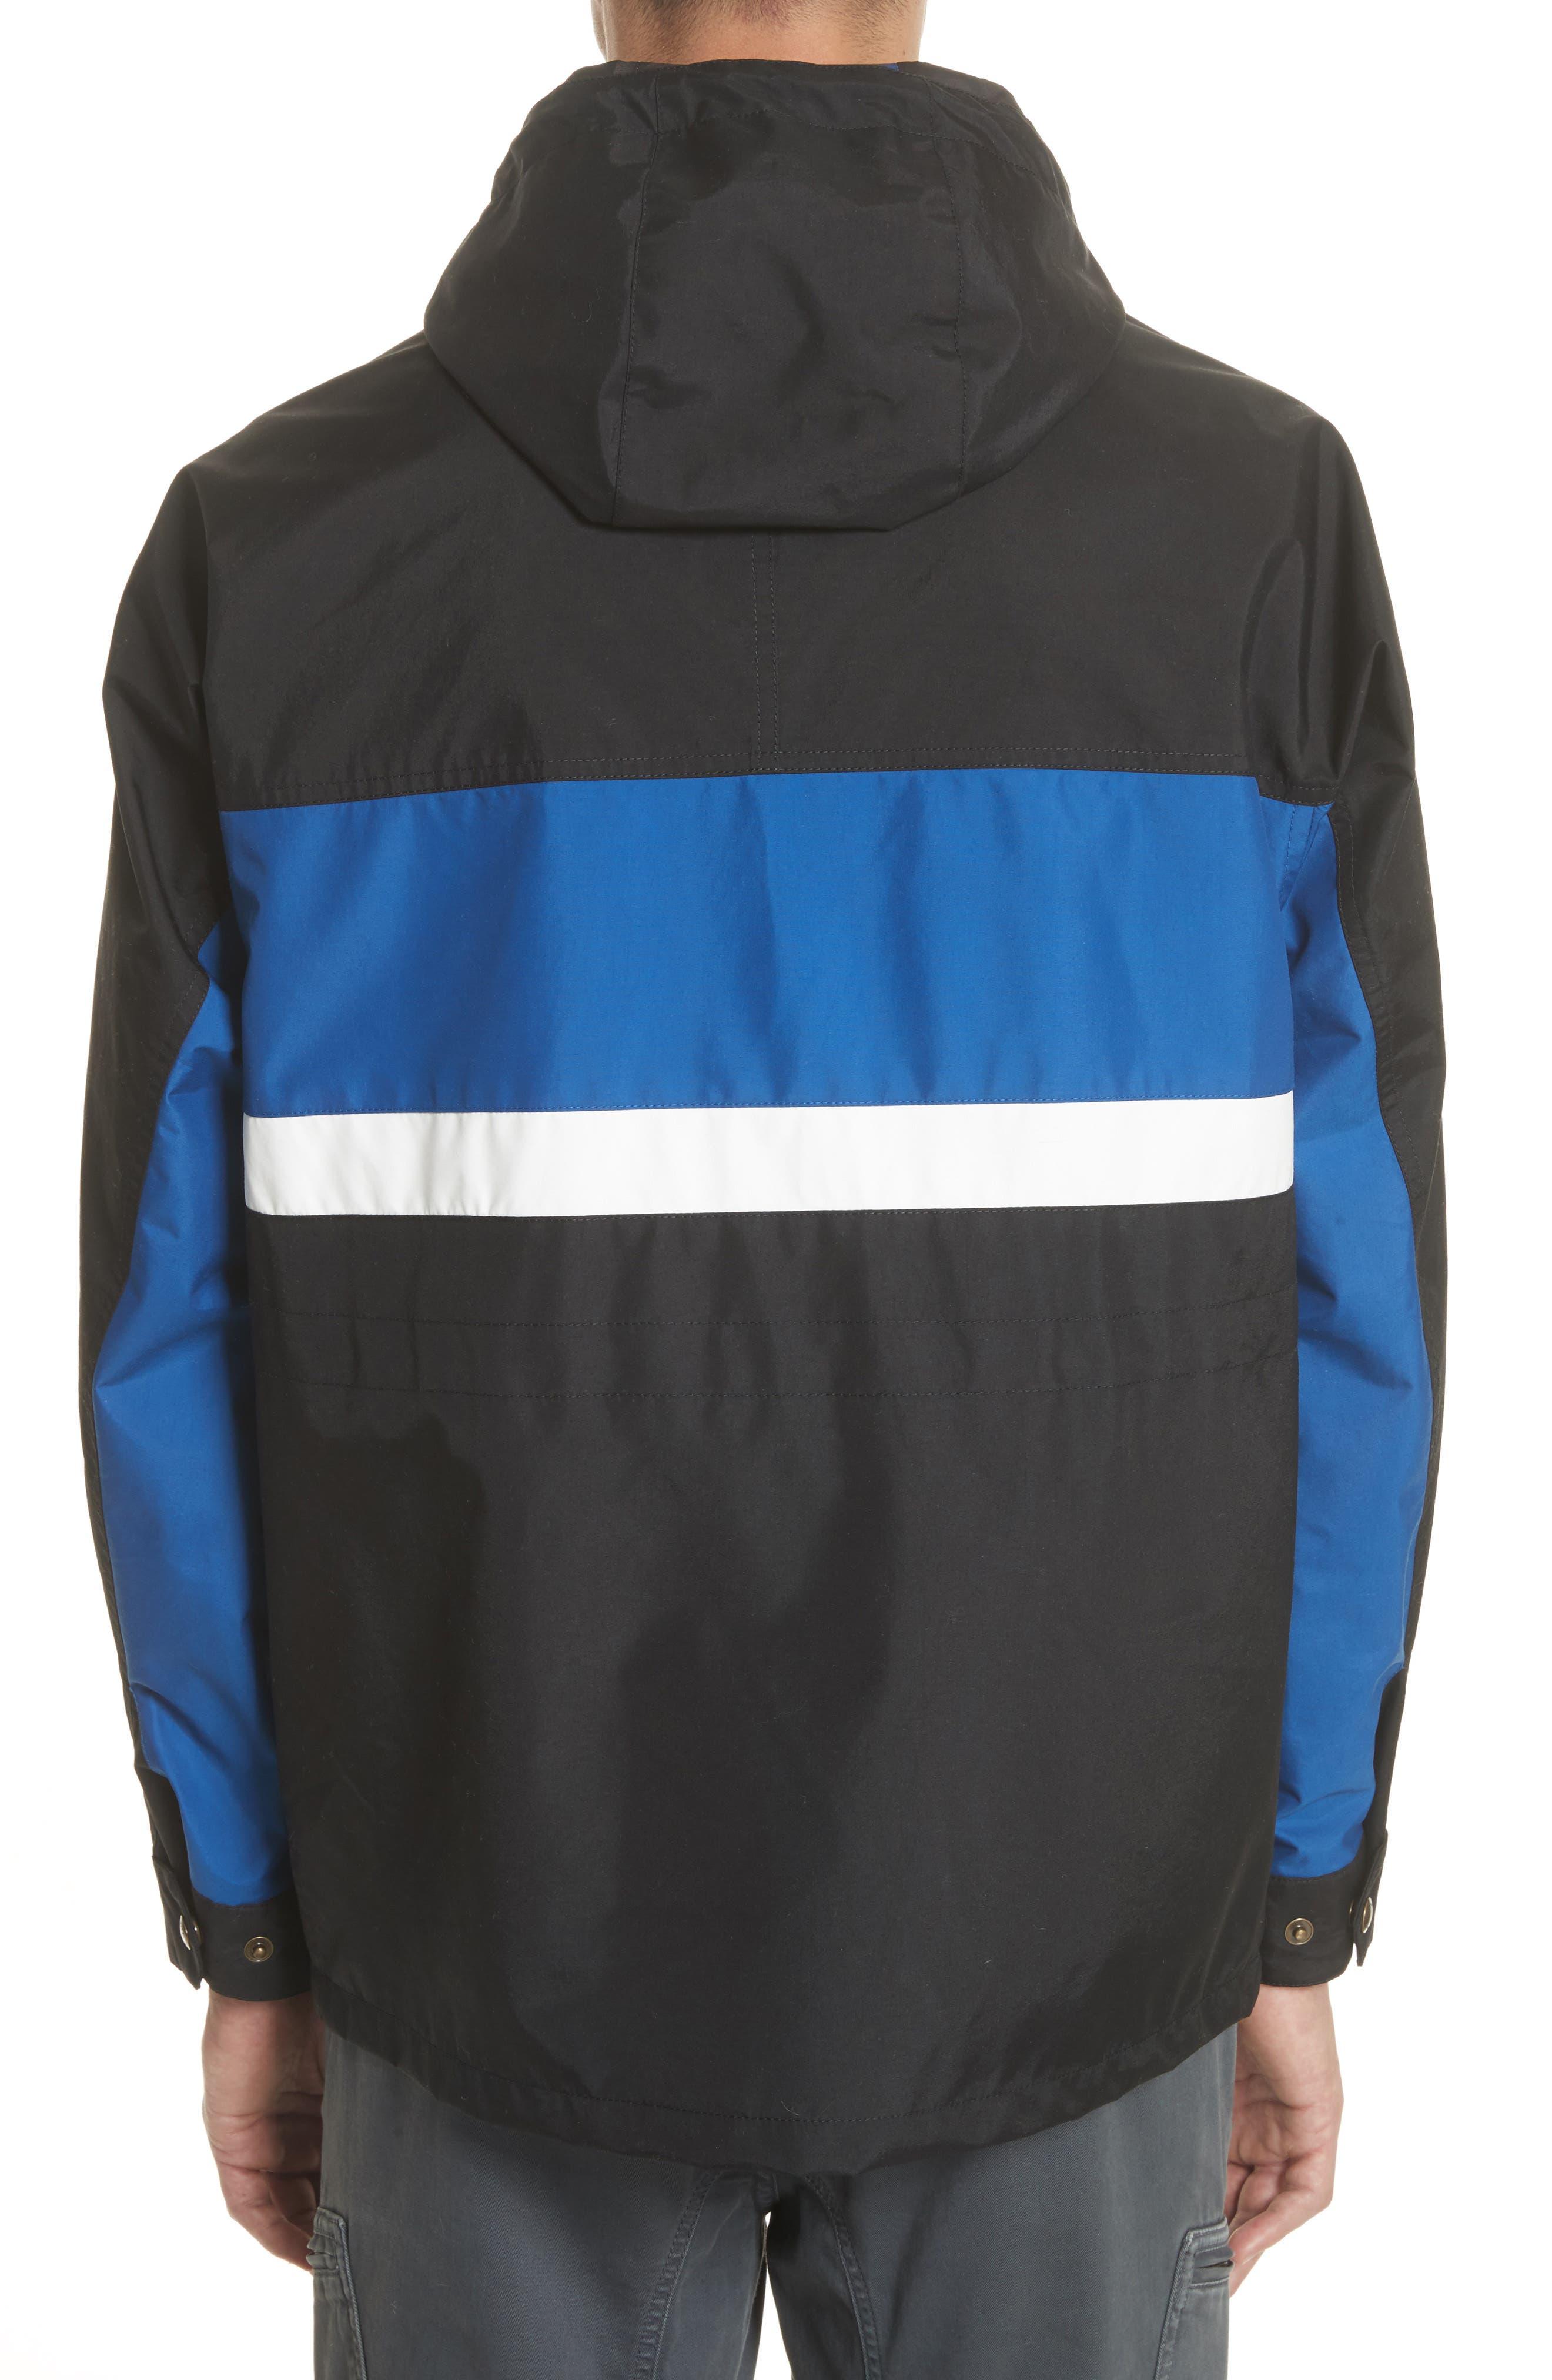 Kersbrook BXS Nylon Jacket,                             Alternate thumbnail 2, color,                             Black